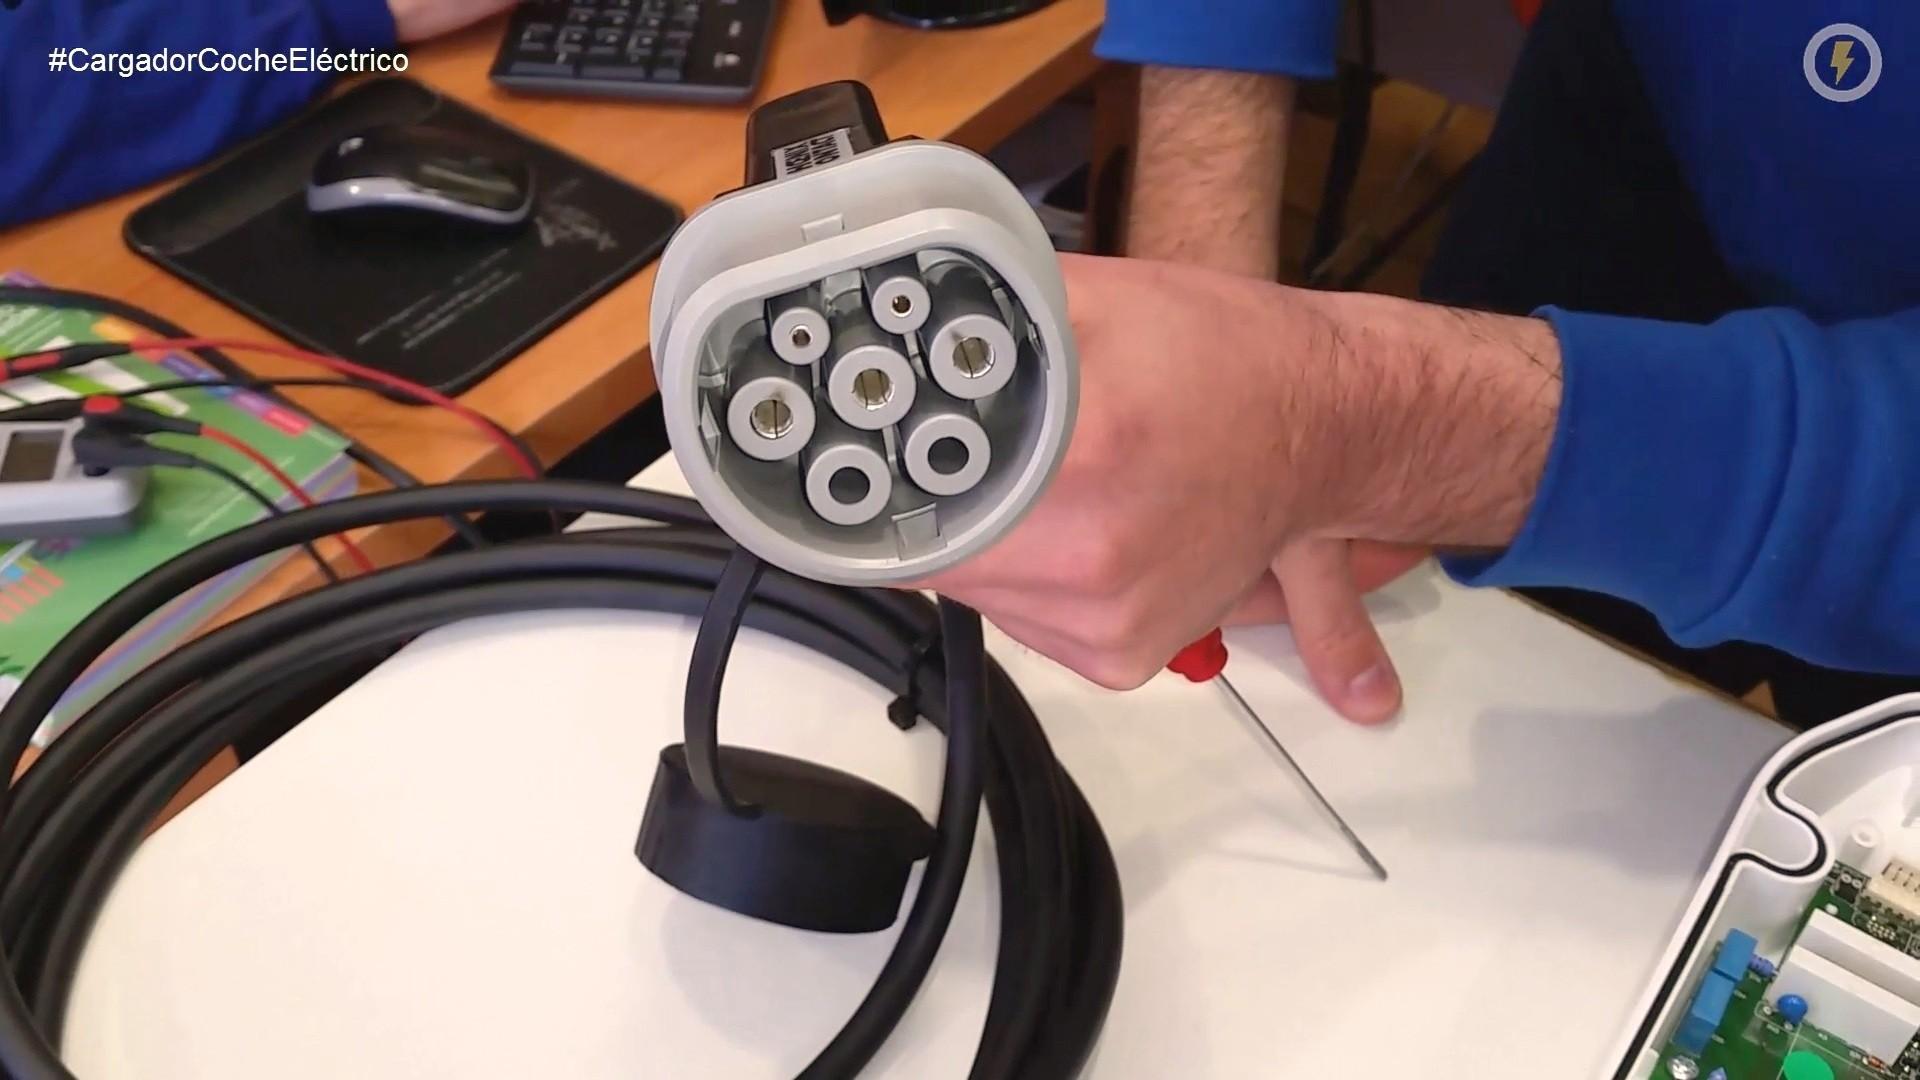 cargador coche_electrico circutor wallbox cable menneke tipo 2 16A